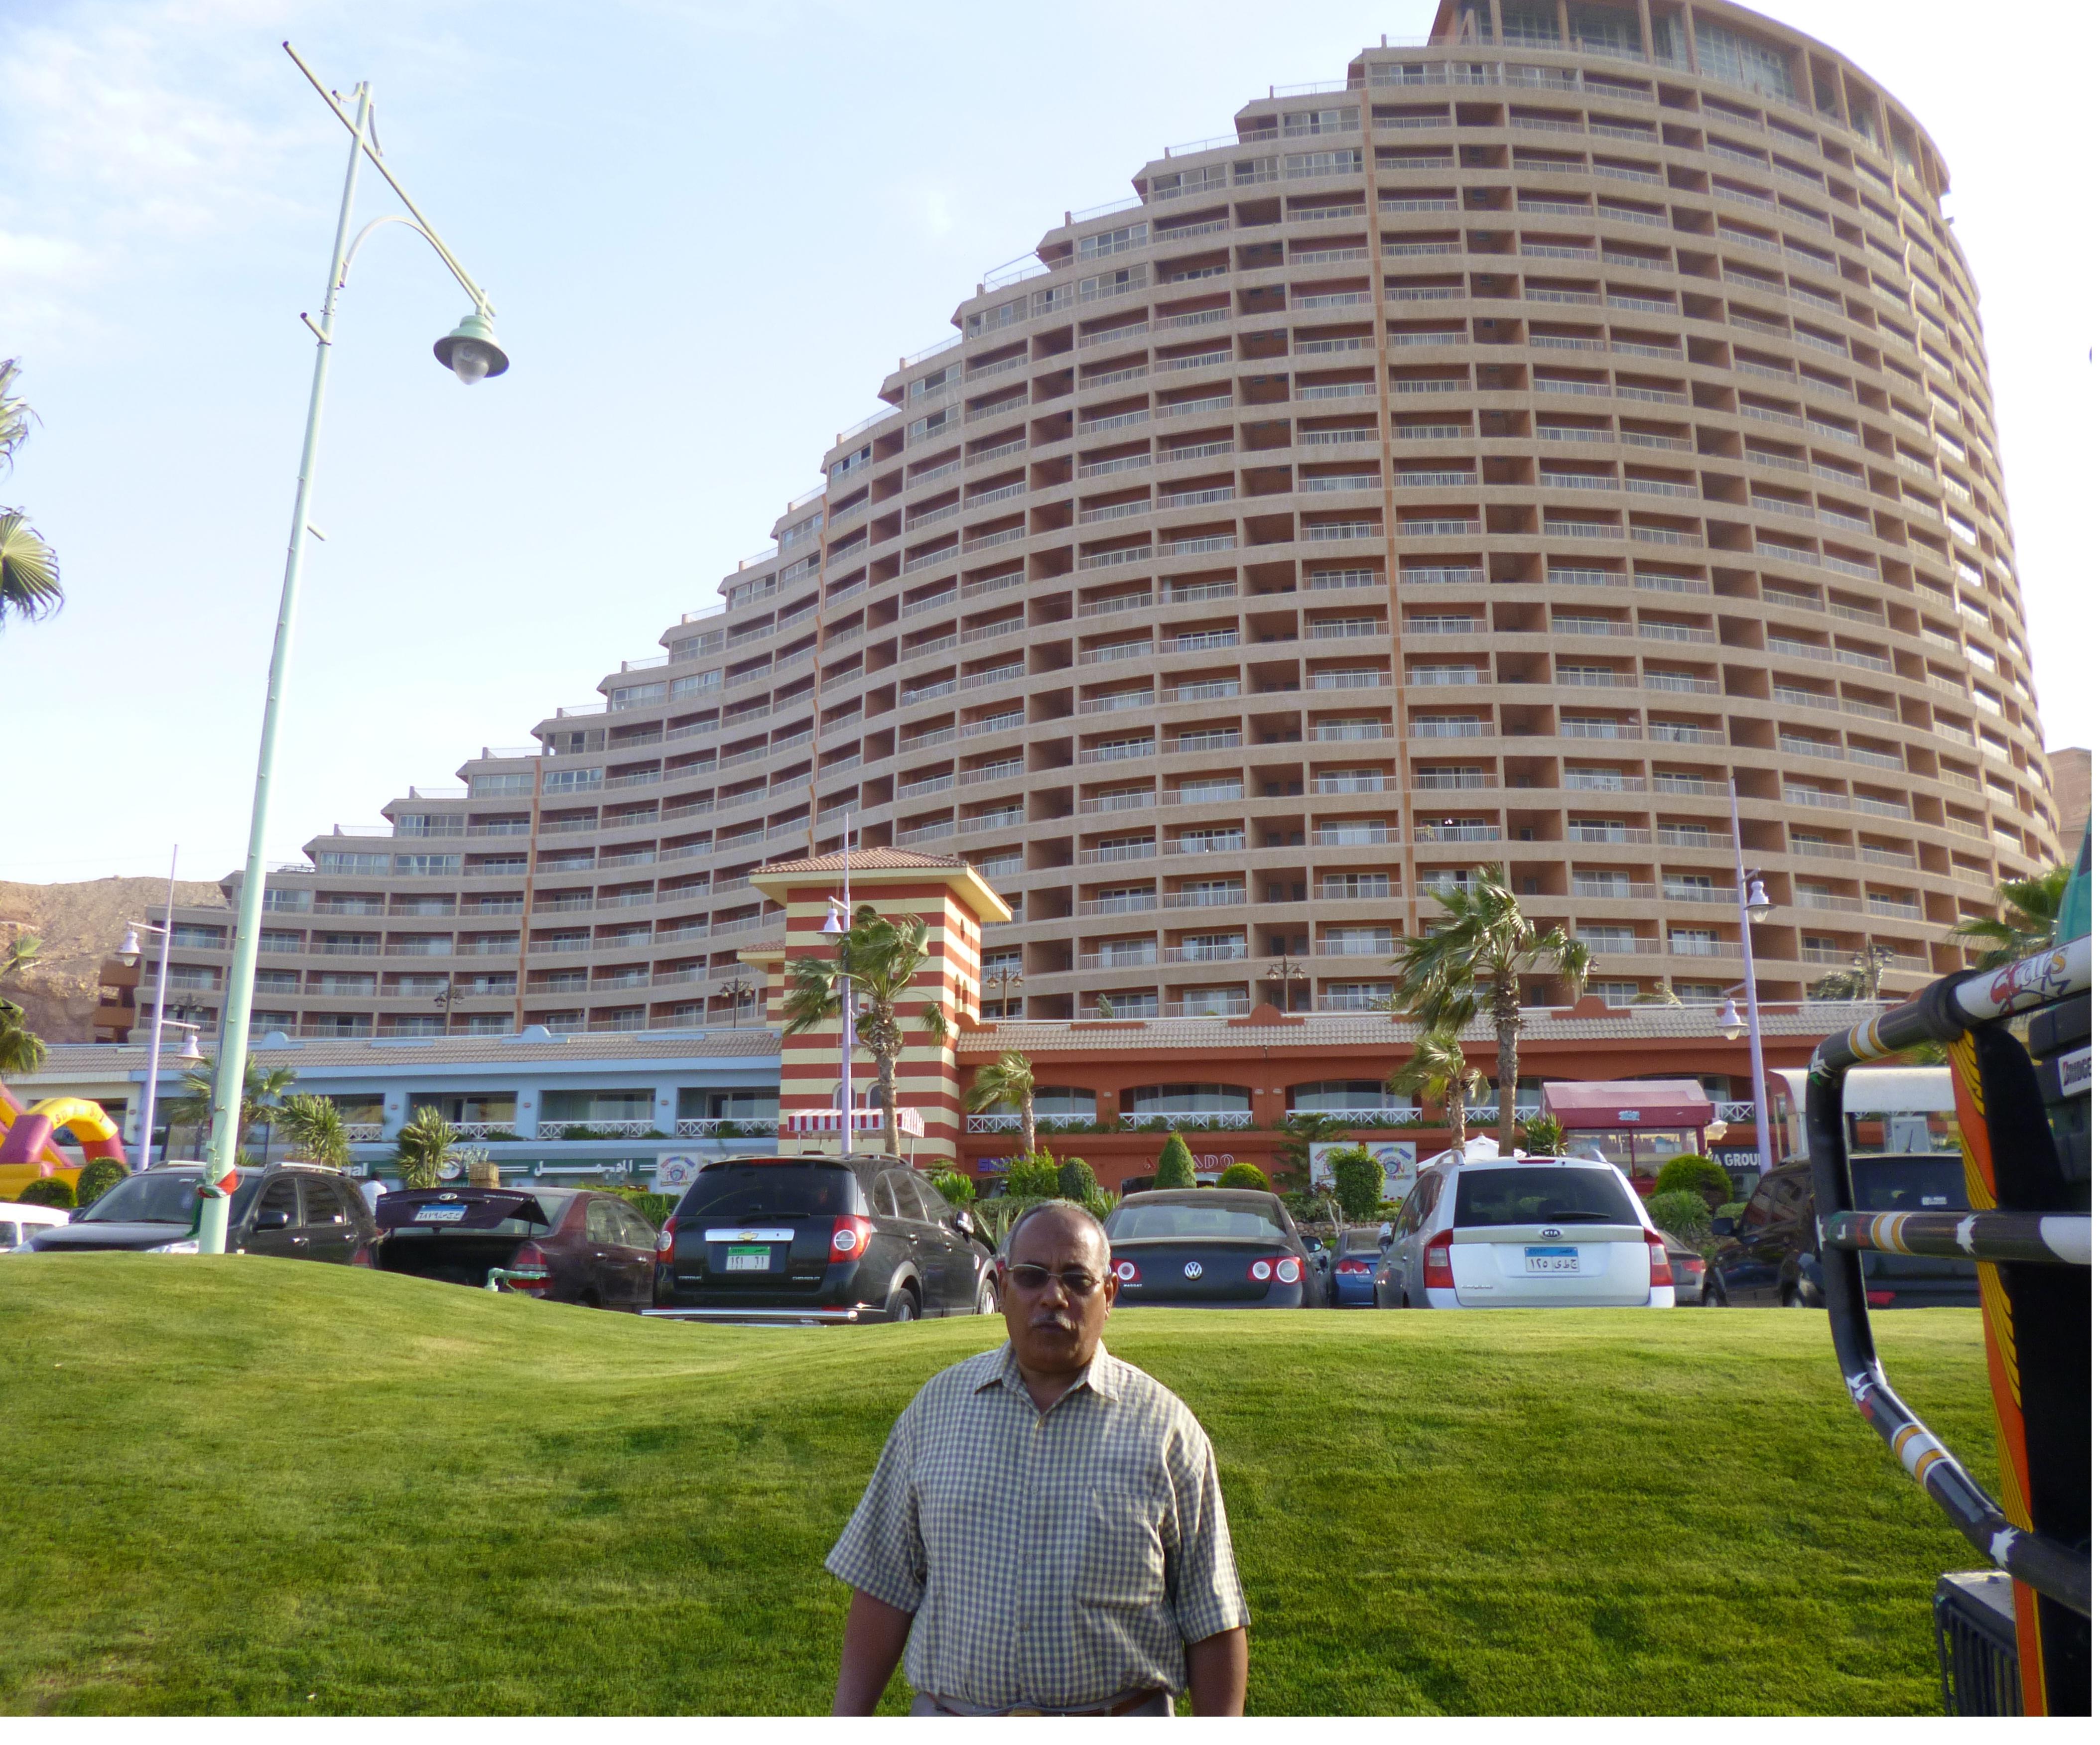 Mohamed Gomaa Ali El-sayed